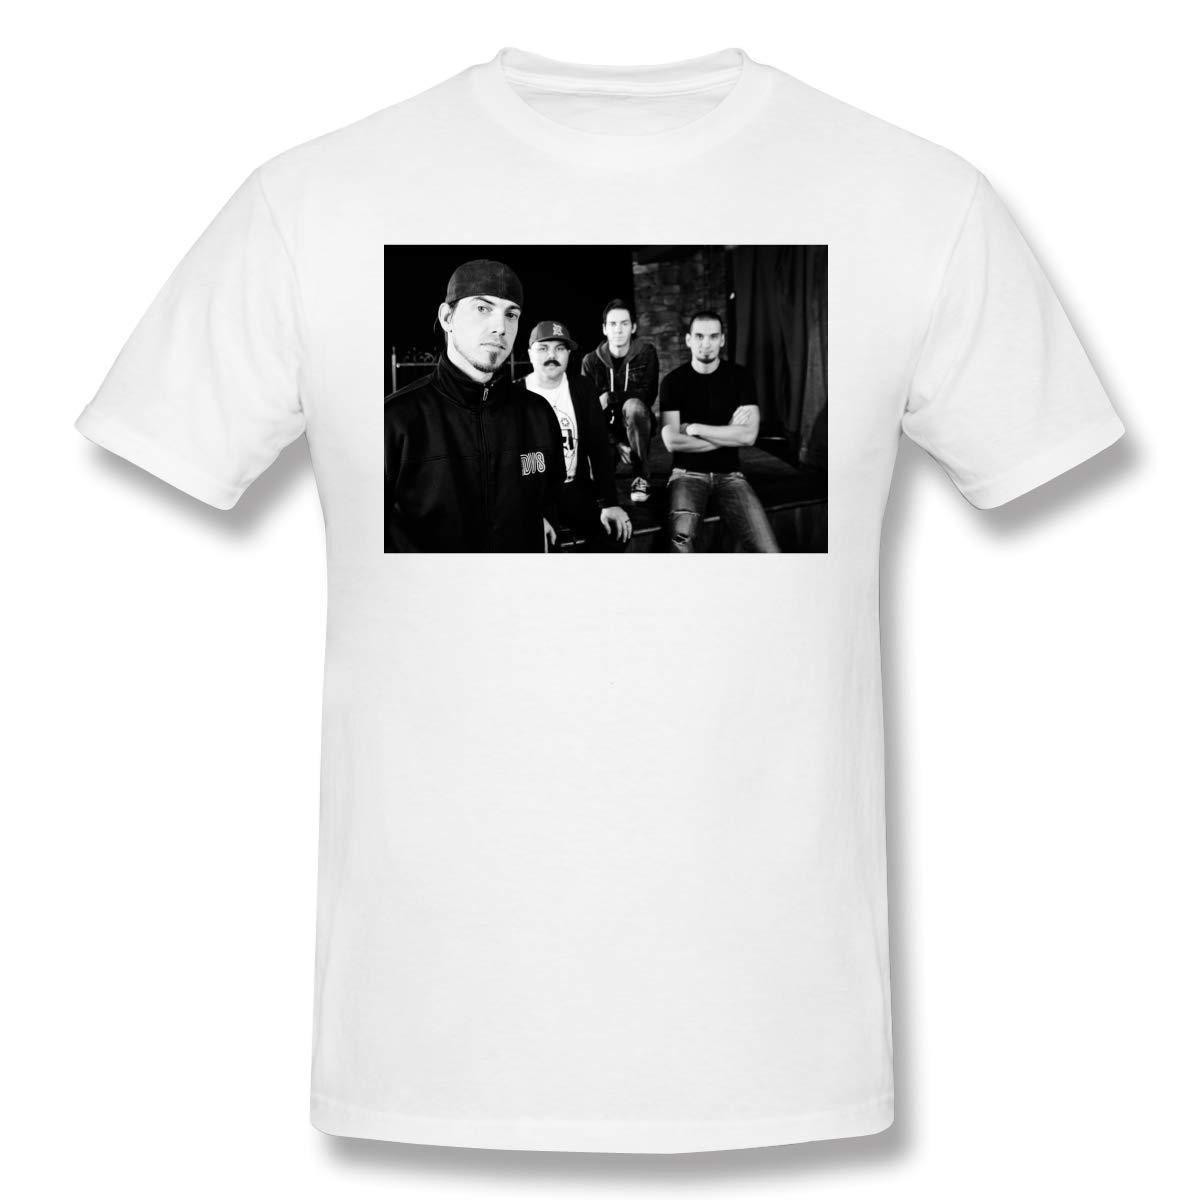 Scattering Man Taproot Band Generous Print Tshirt